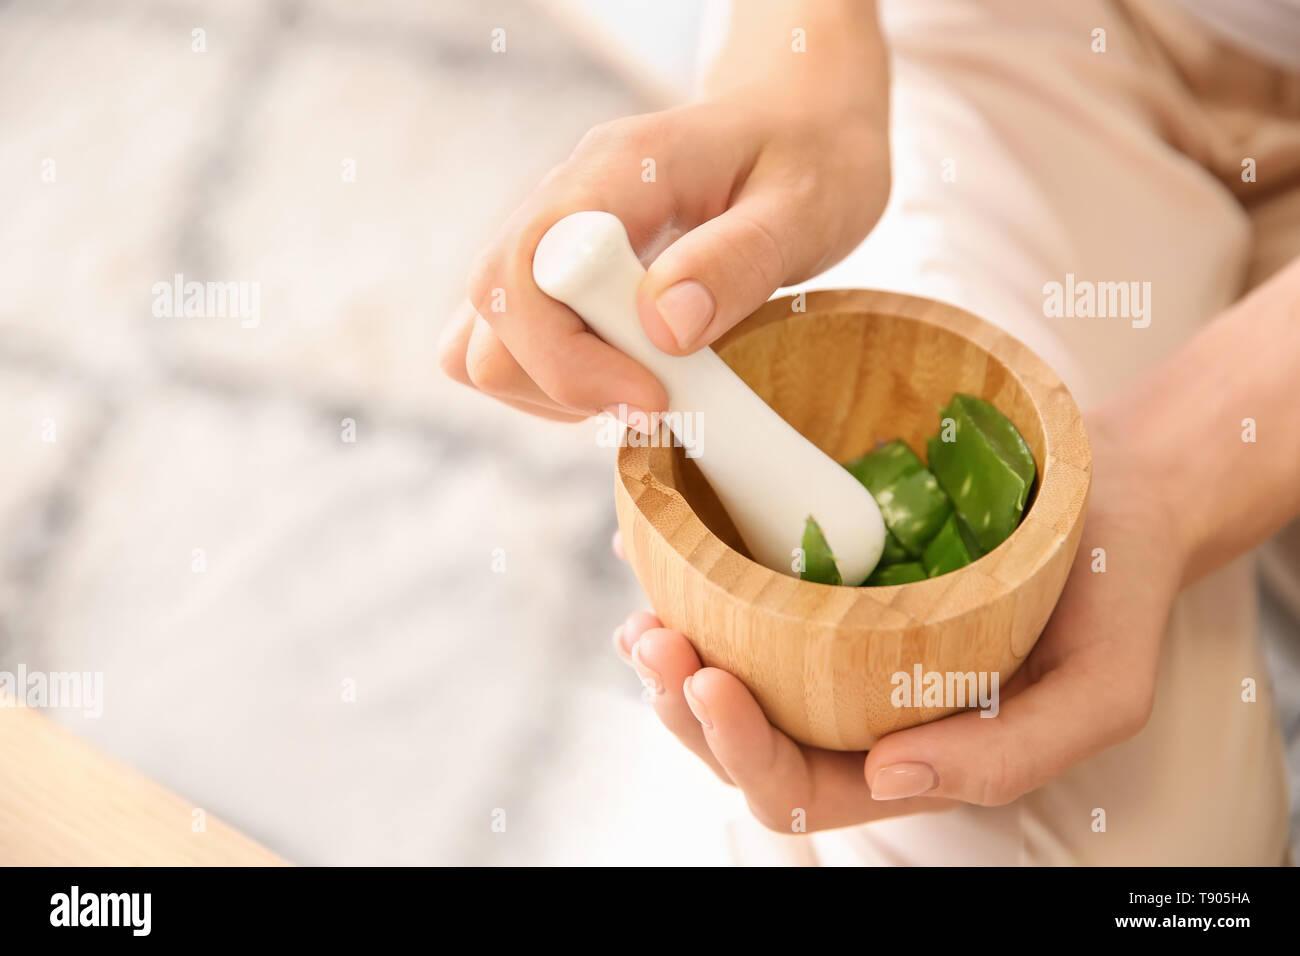 Young woman making healthy facial mask with aloe vera extract at home, closeup - Stock Image